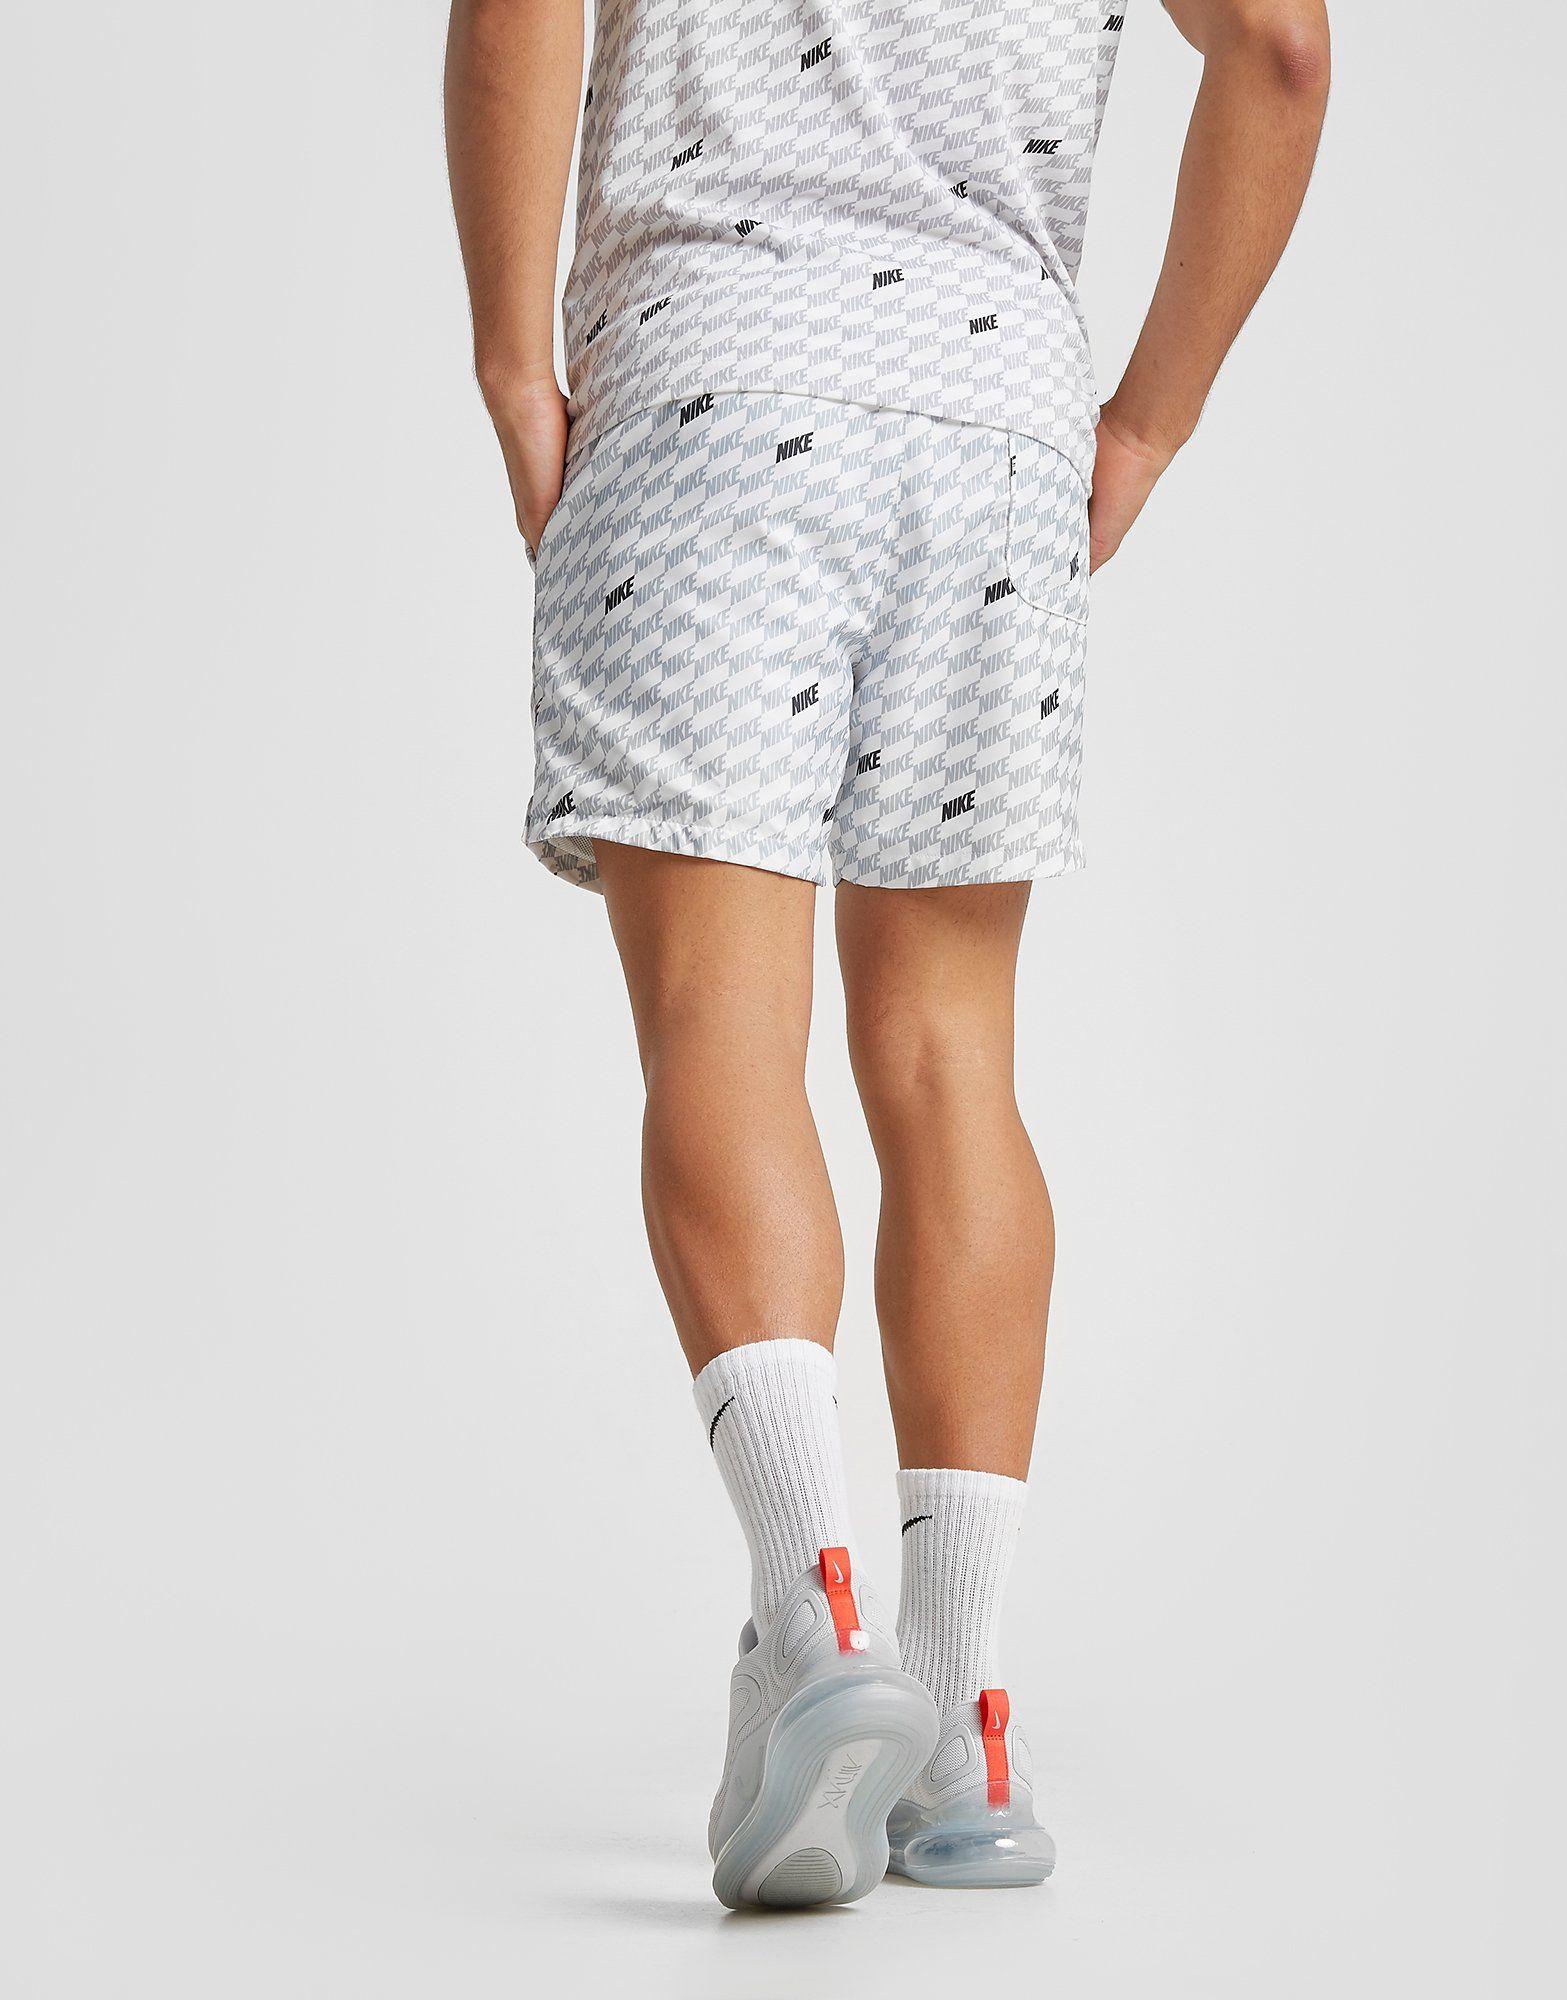 Nike Hybrid All Over Print Swim Shorts